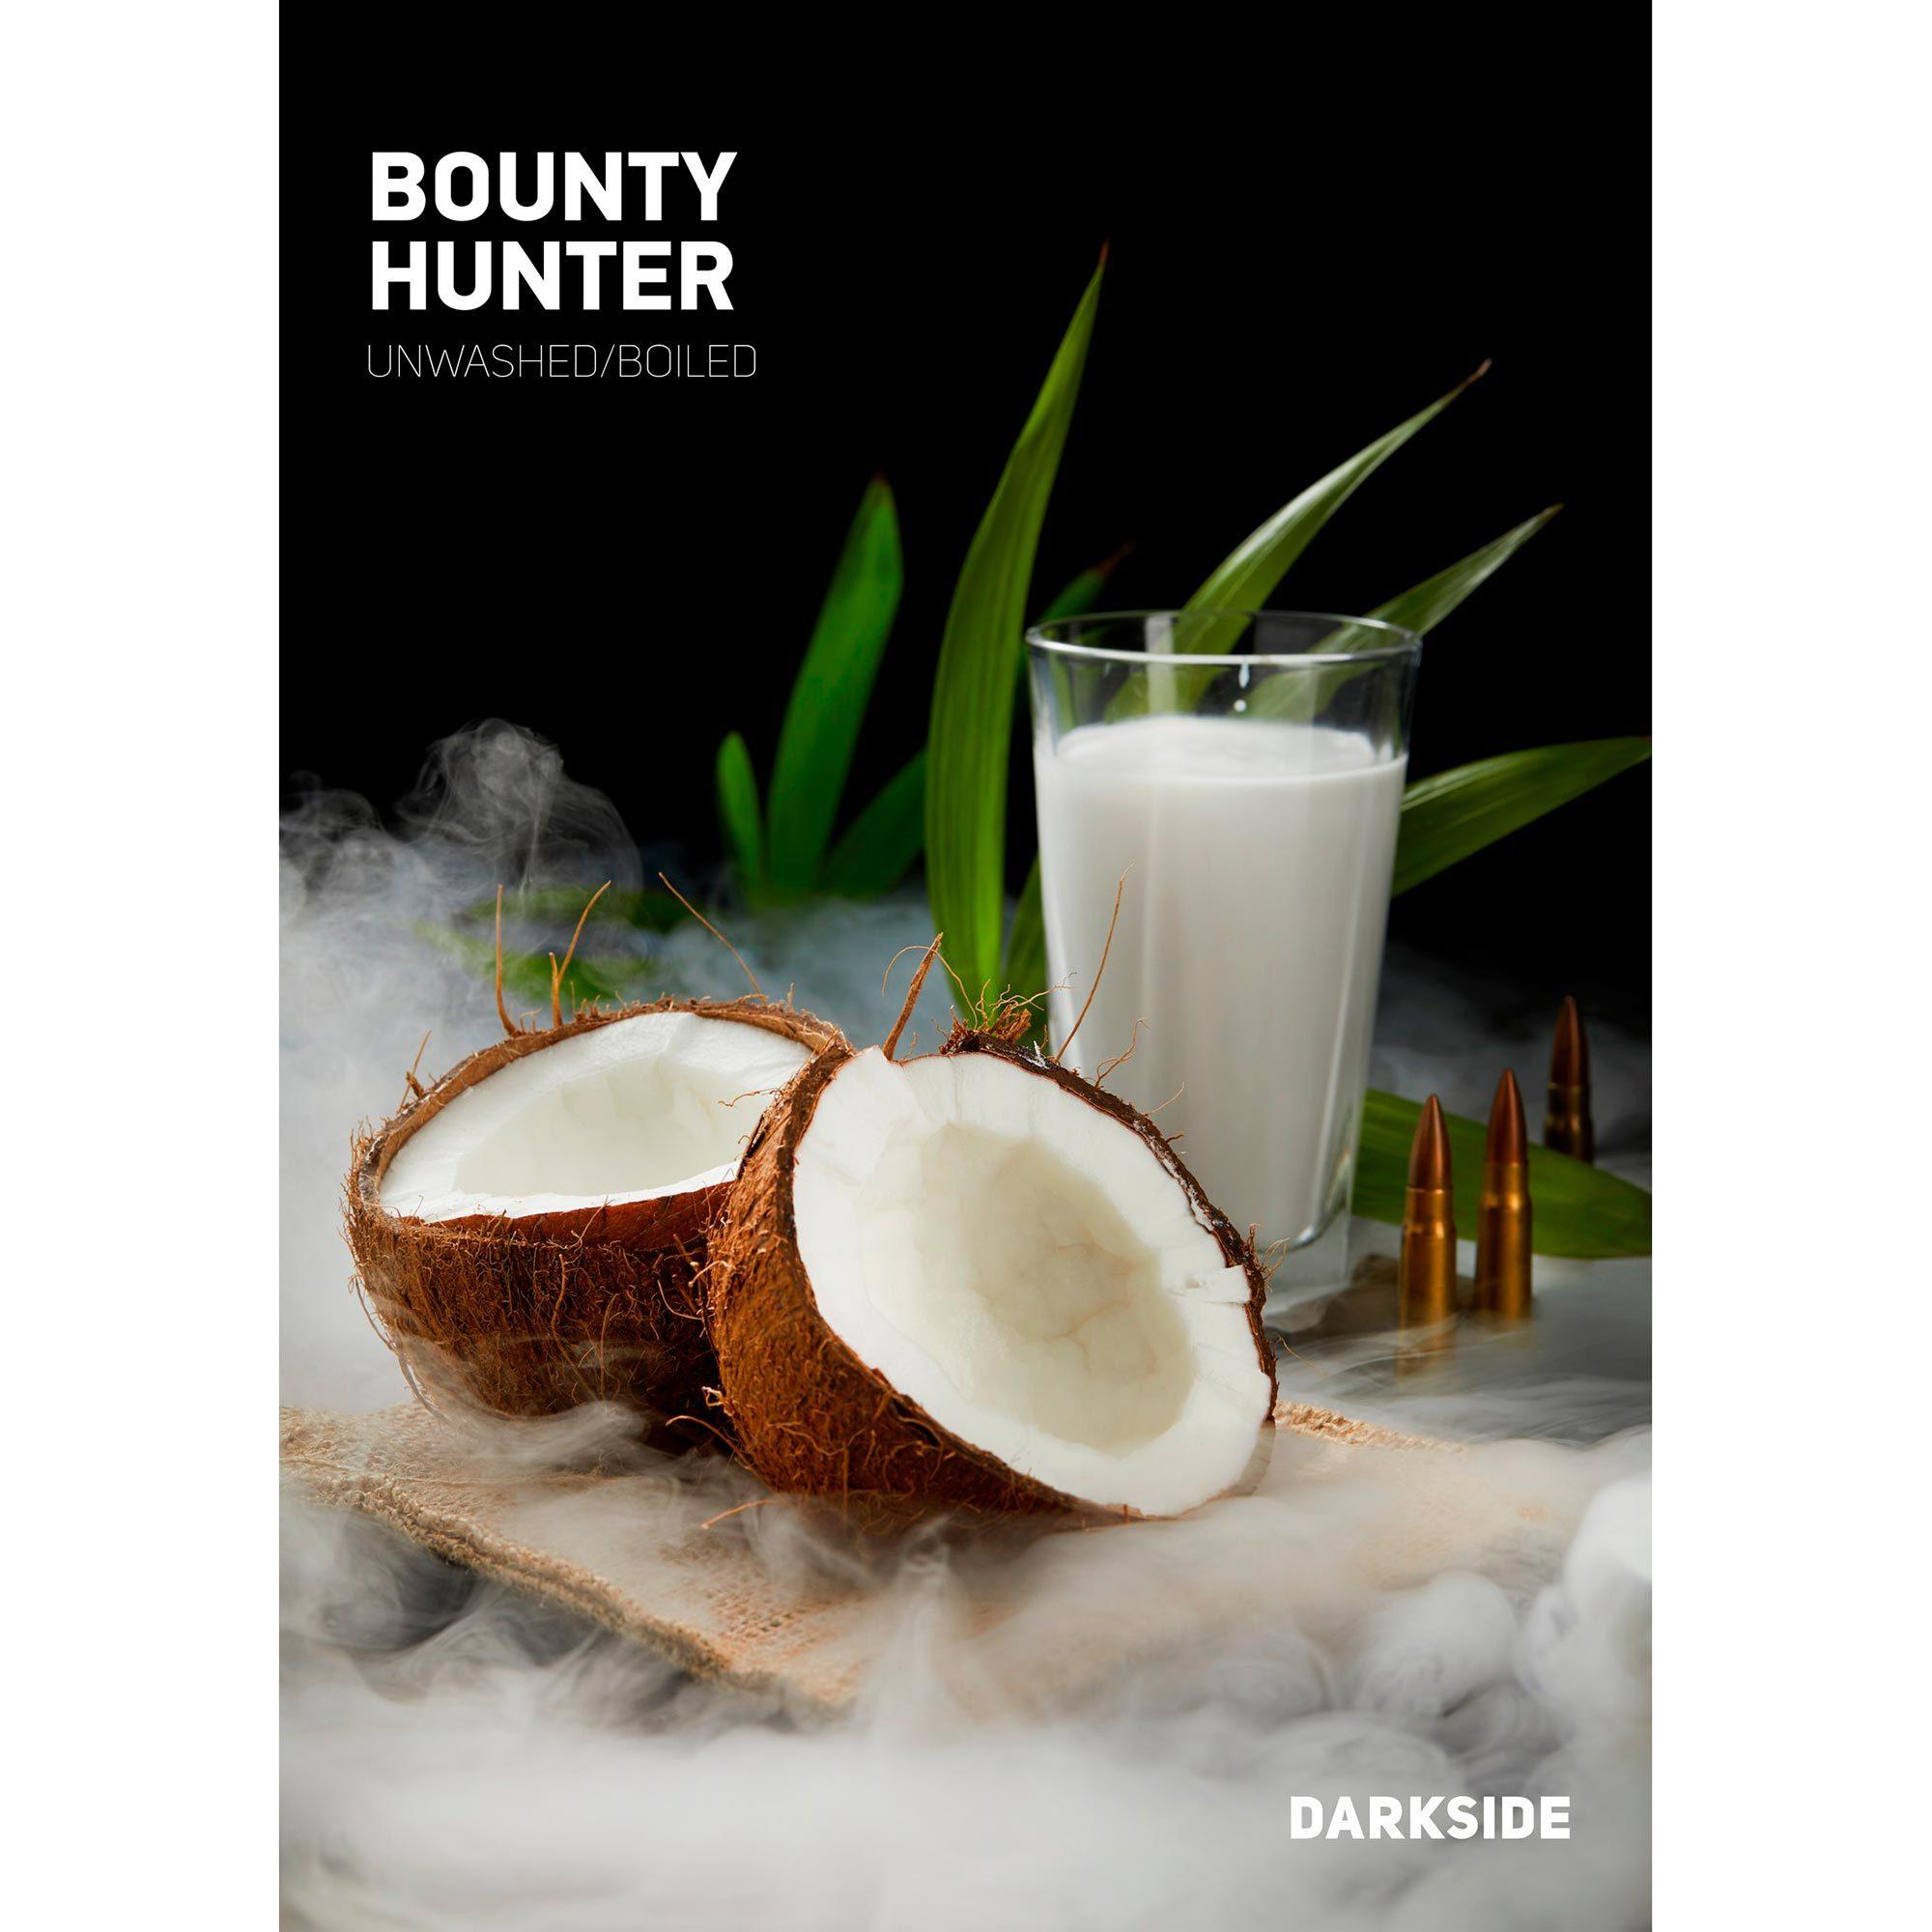 Табак для кальяна Dark Side Core 100 гр Bounty Hunter, магазин FOHM